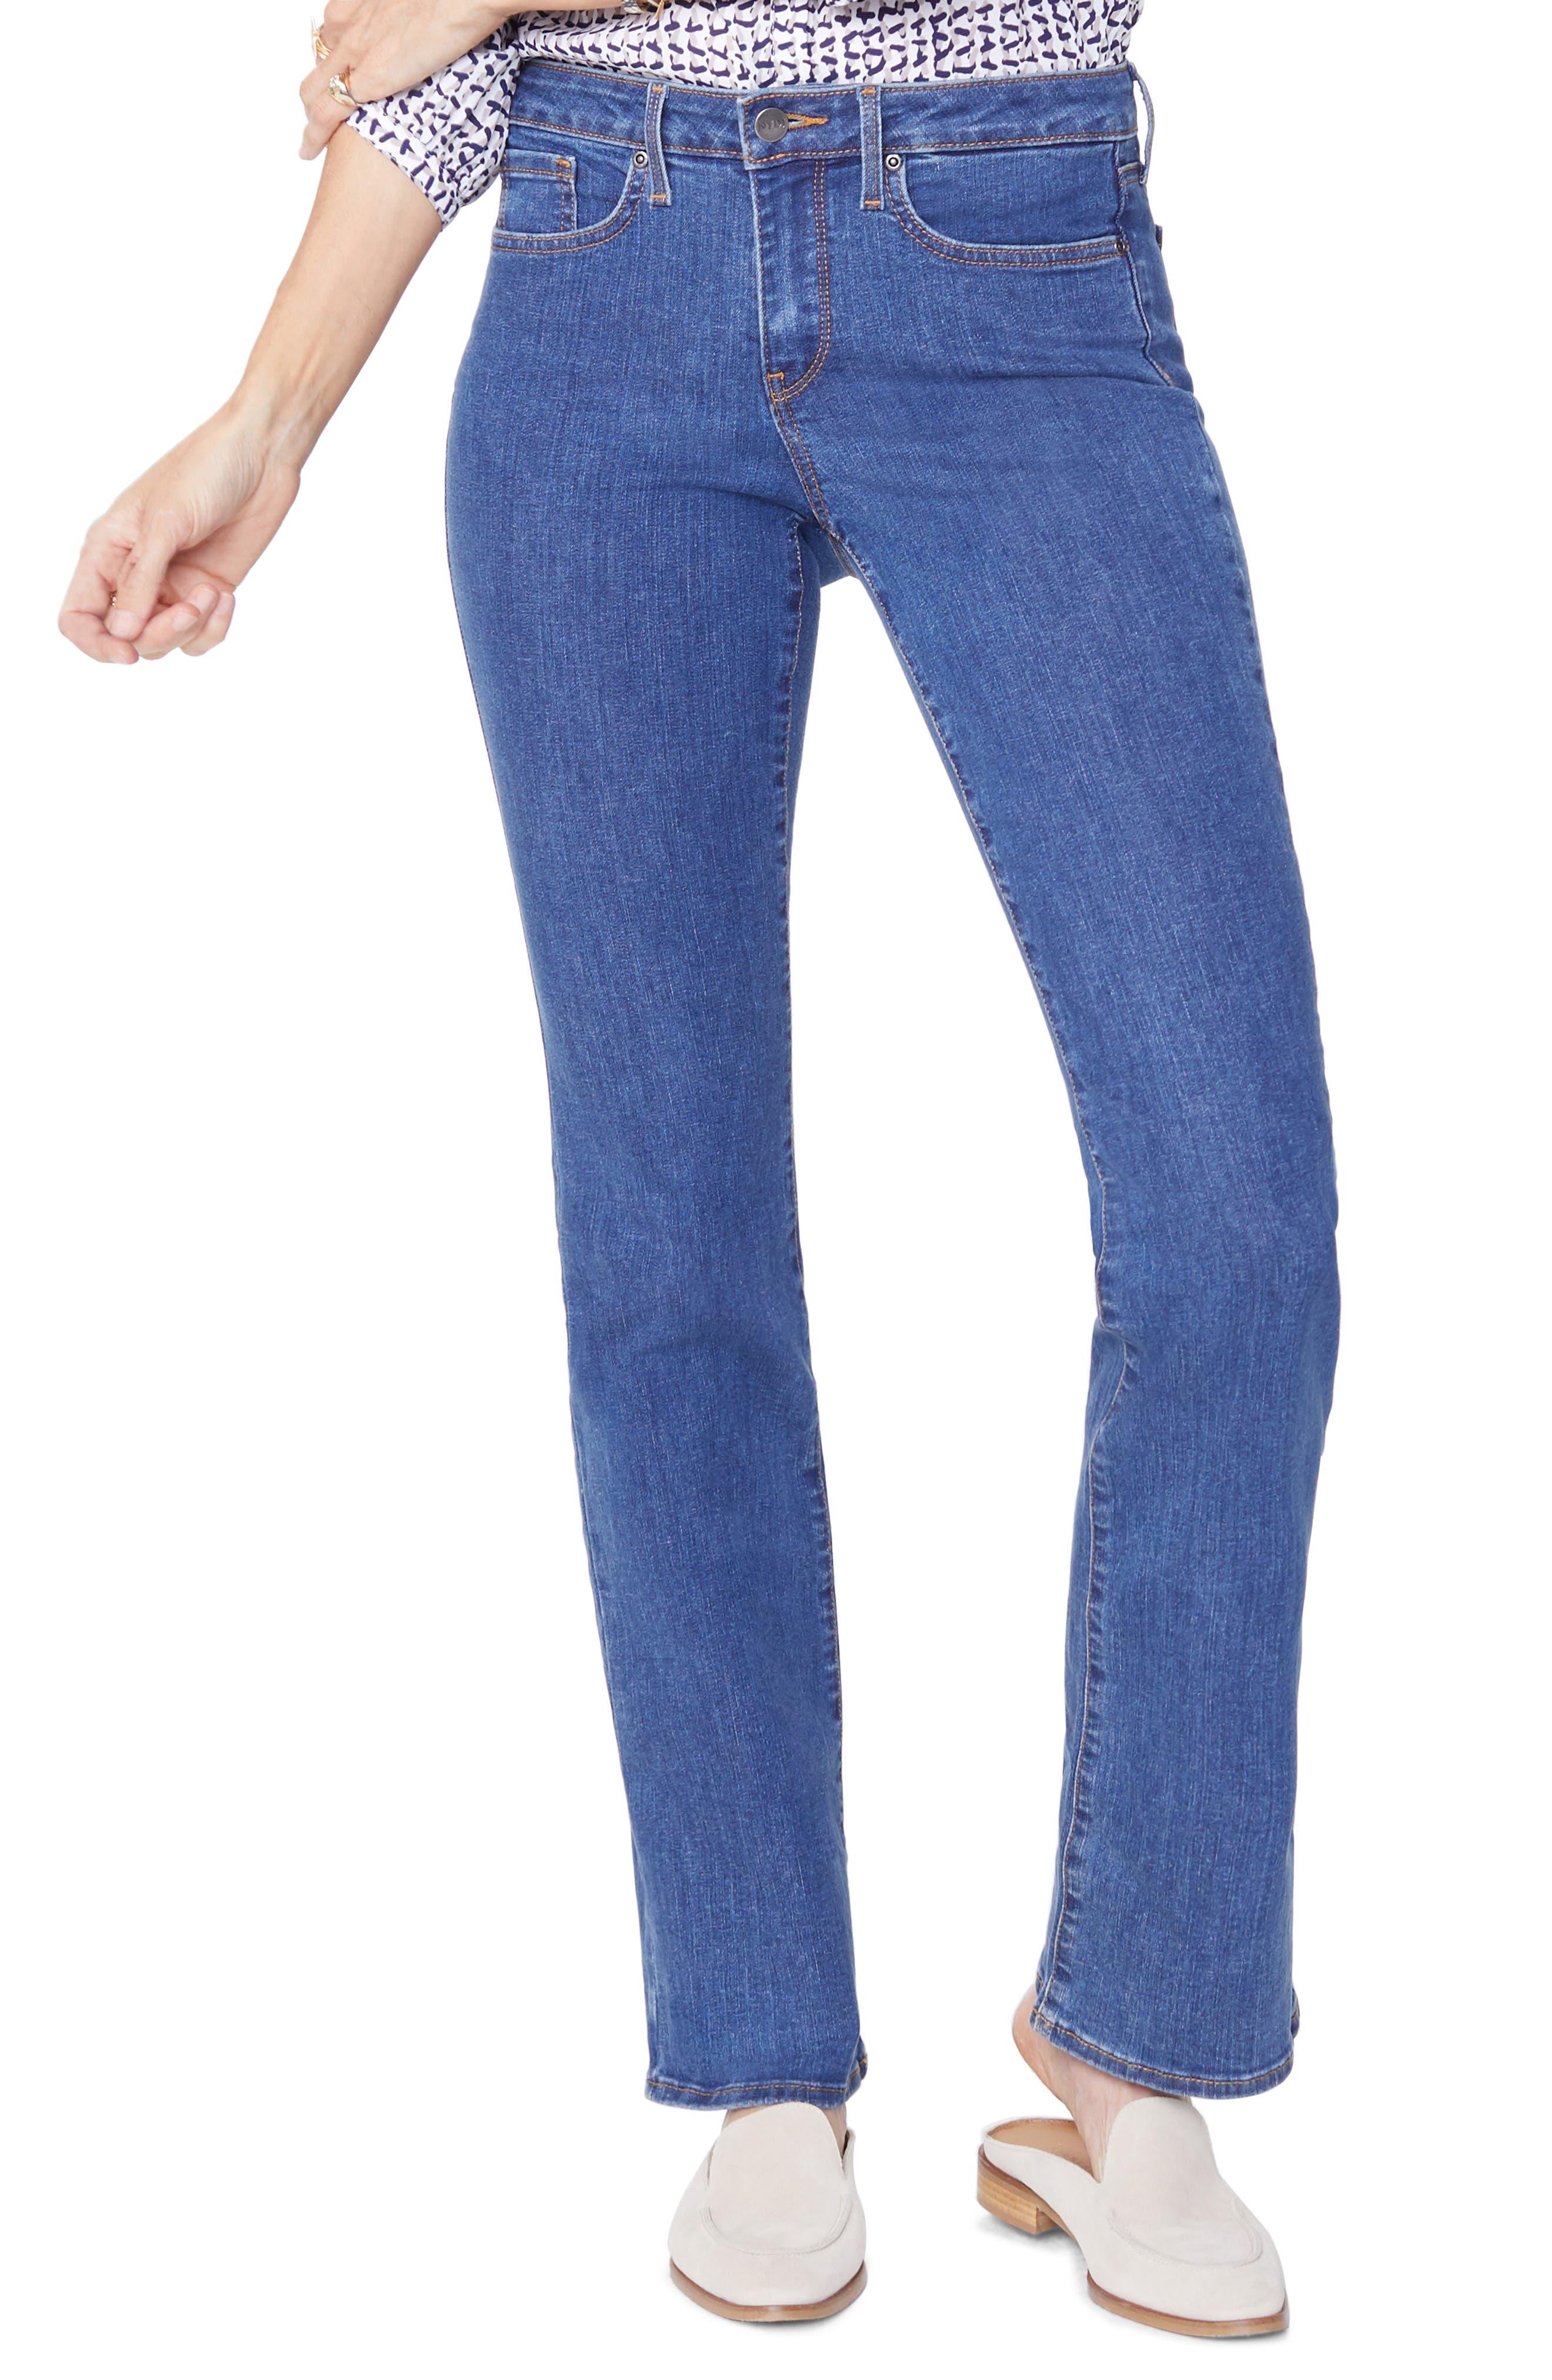 NYDJ, Barbara Stretch Bootcut Jeans, Main thumbnail 1, color, BATIK BLUE